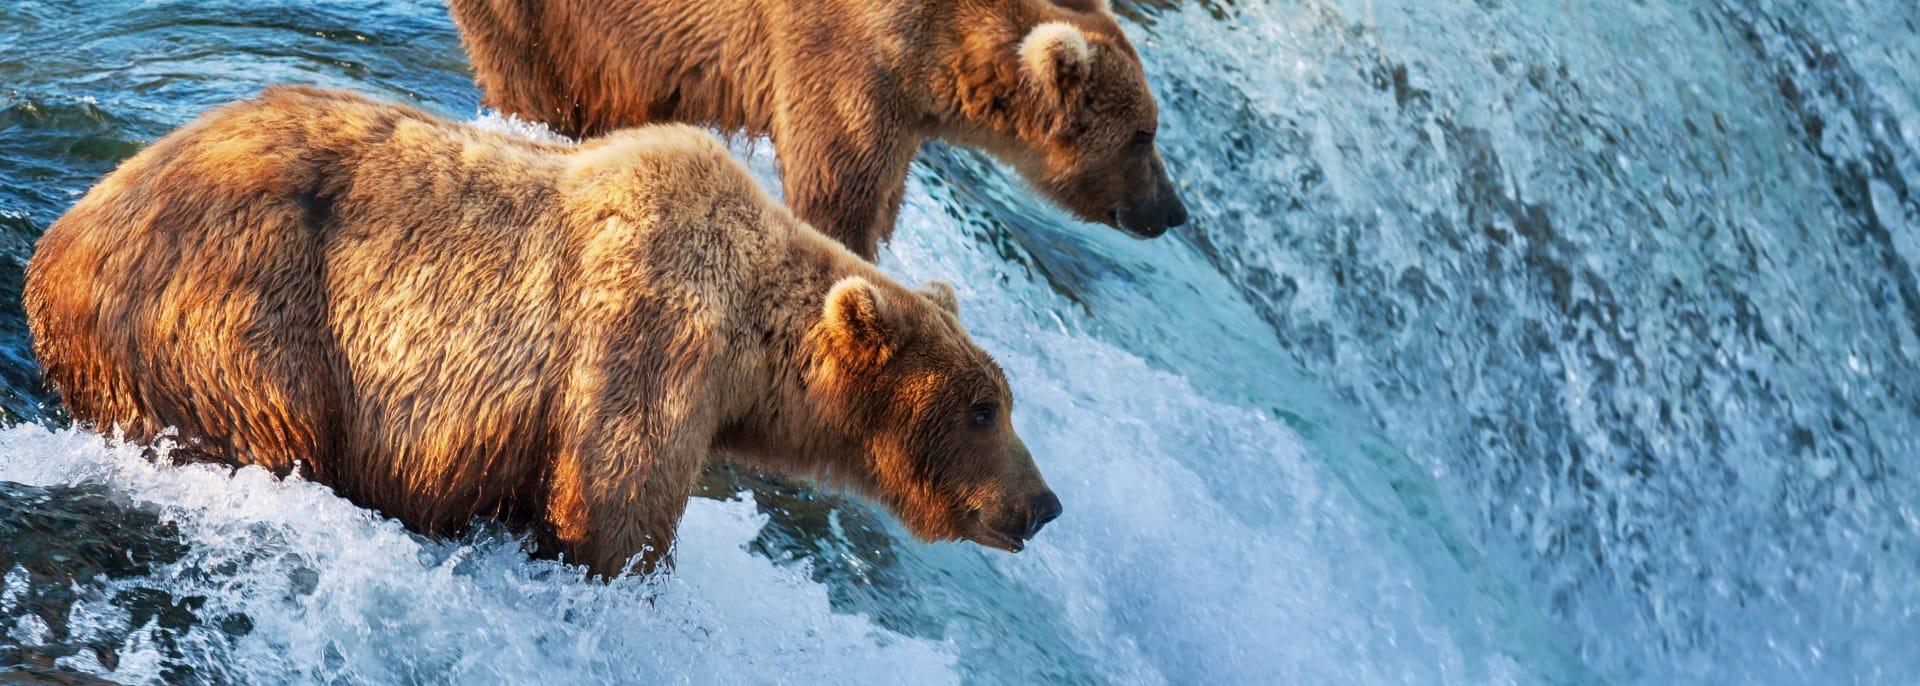 Wildlife, Alaska